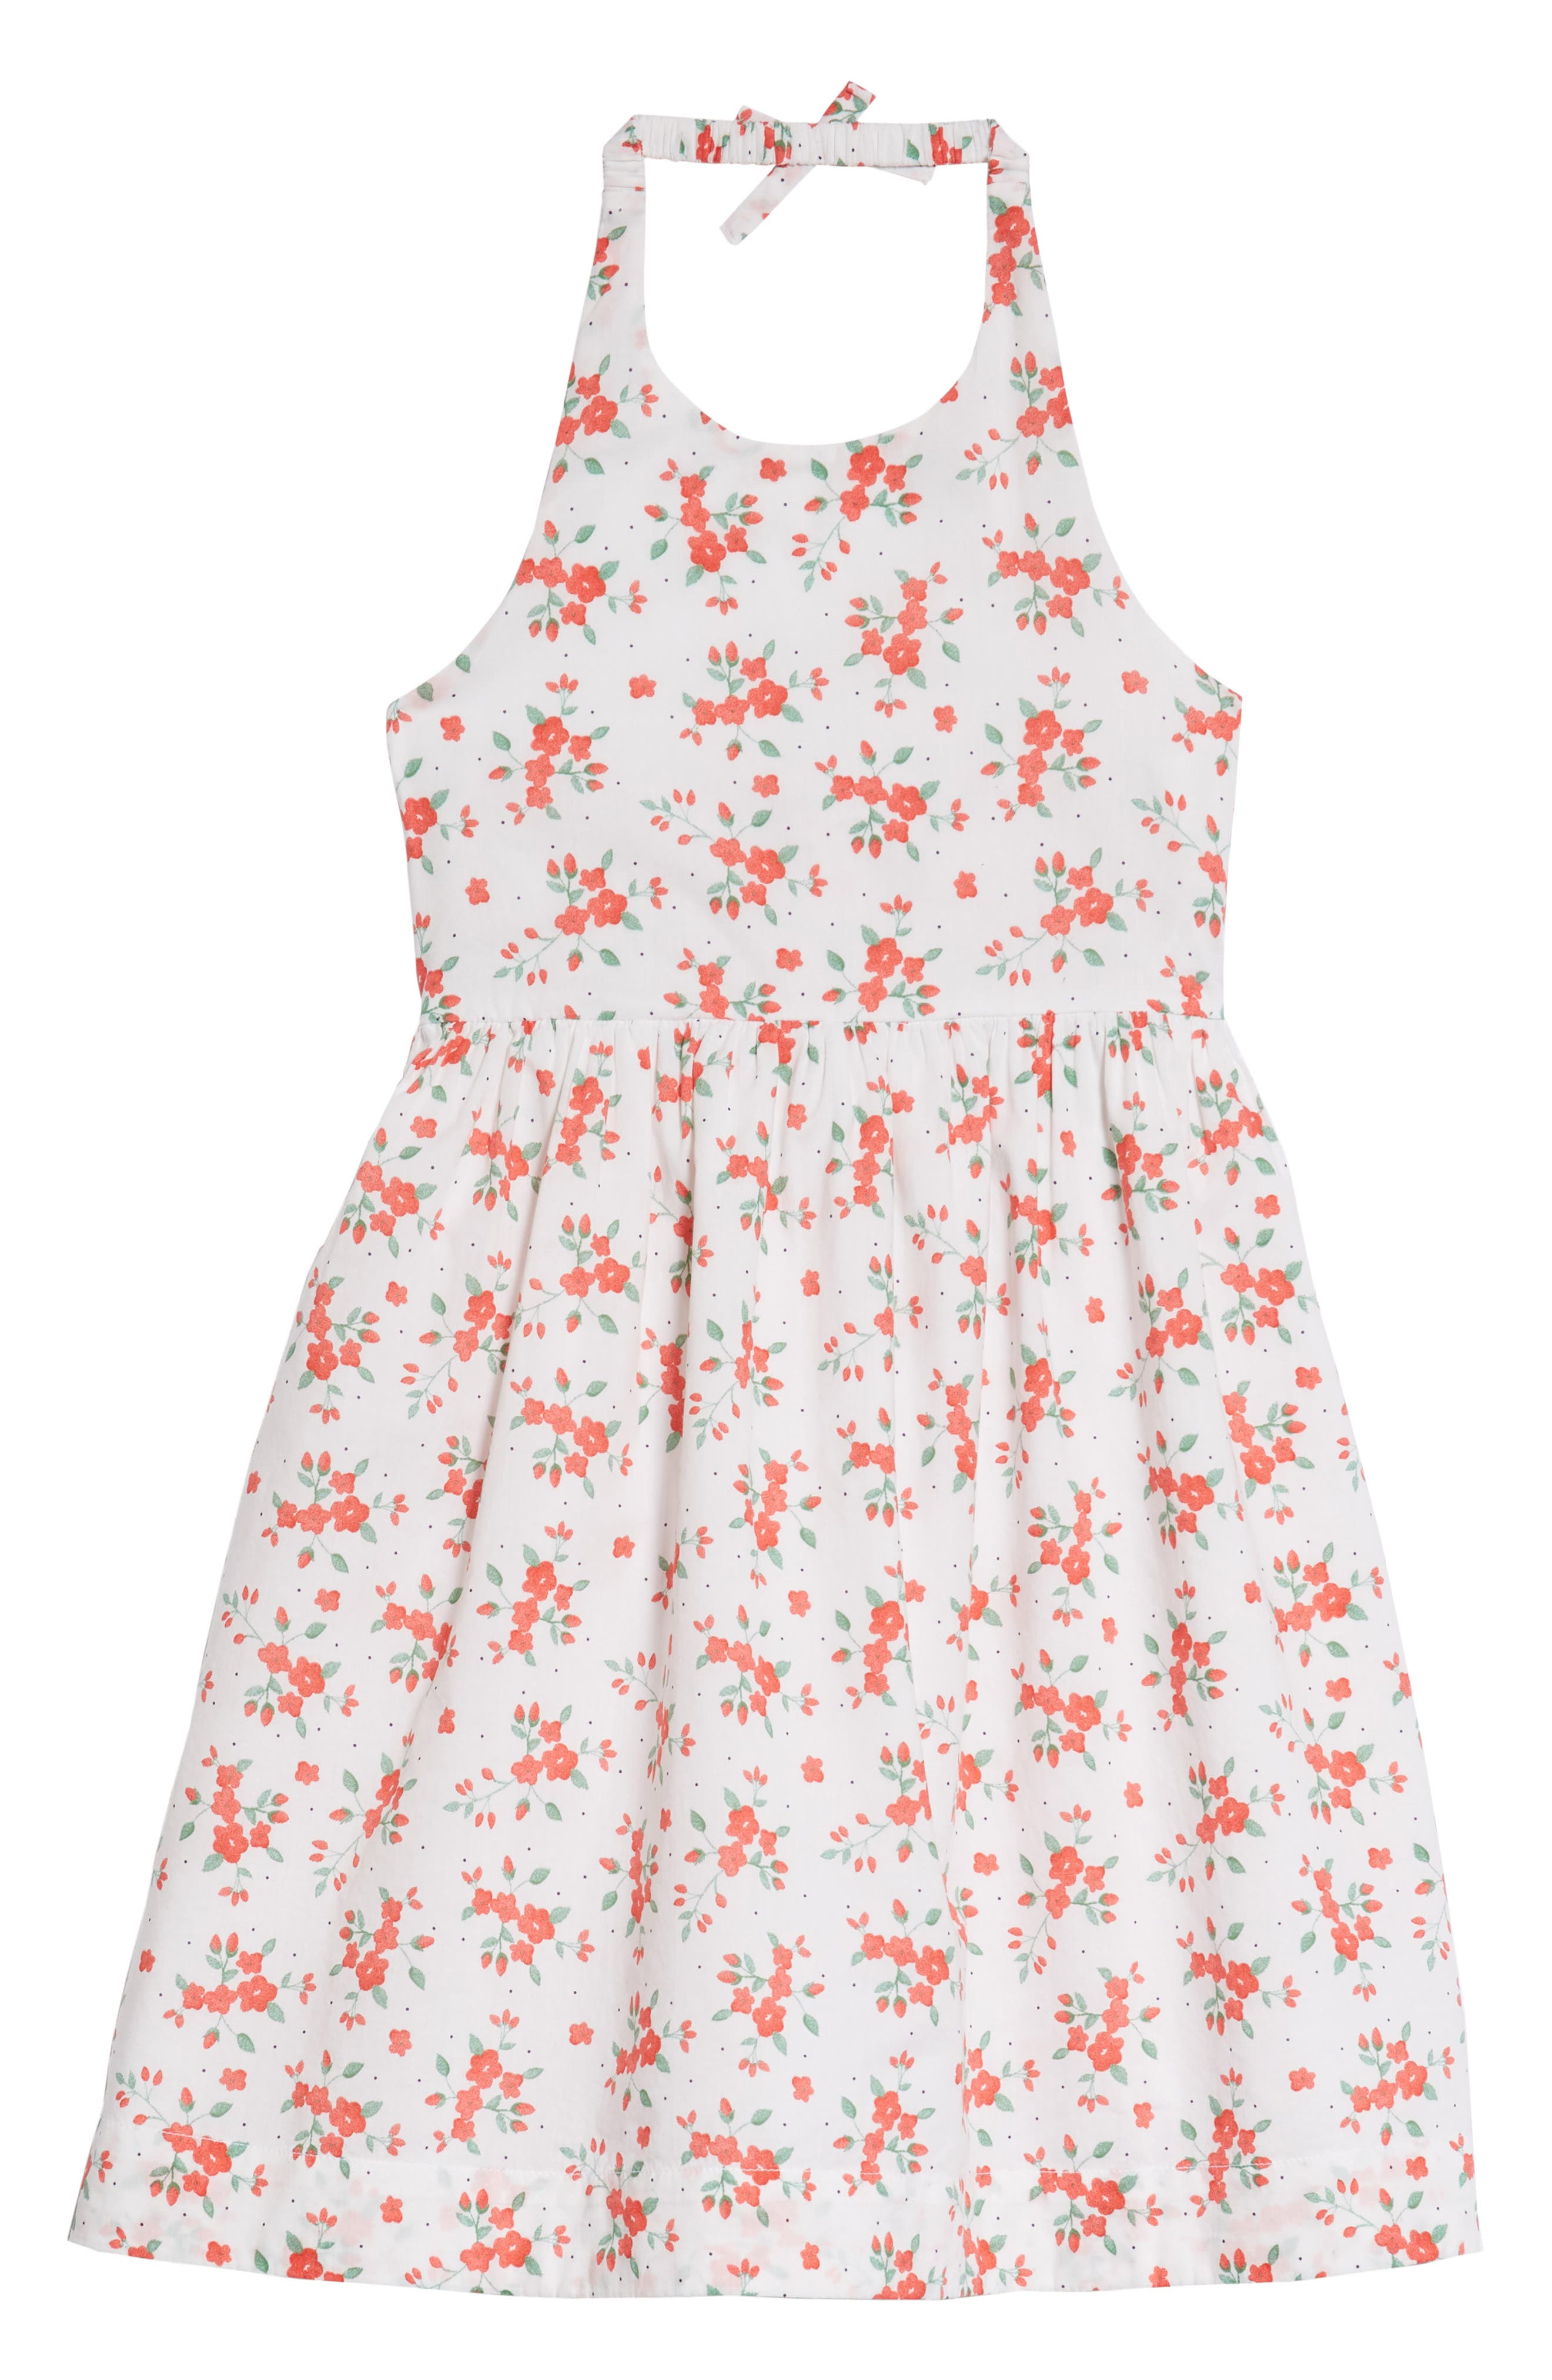 Floral Halter Dress,                             Main thumbnail 1, color,                             100